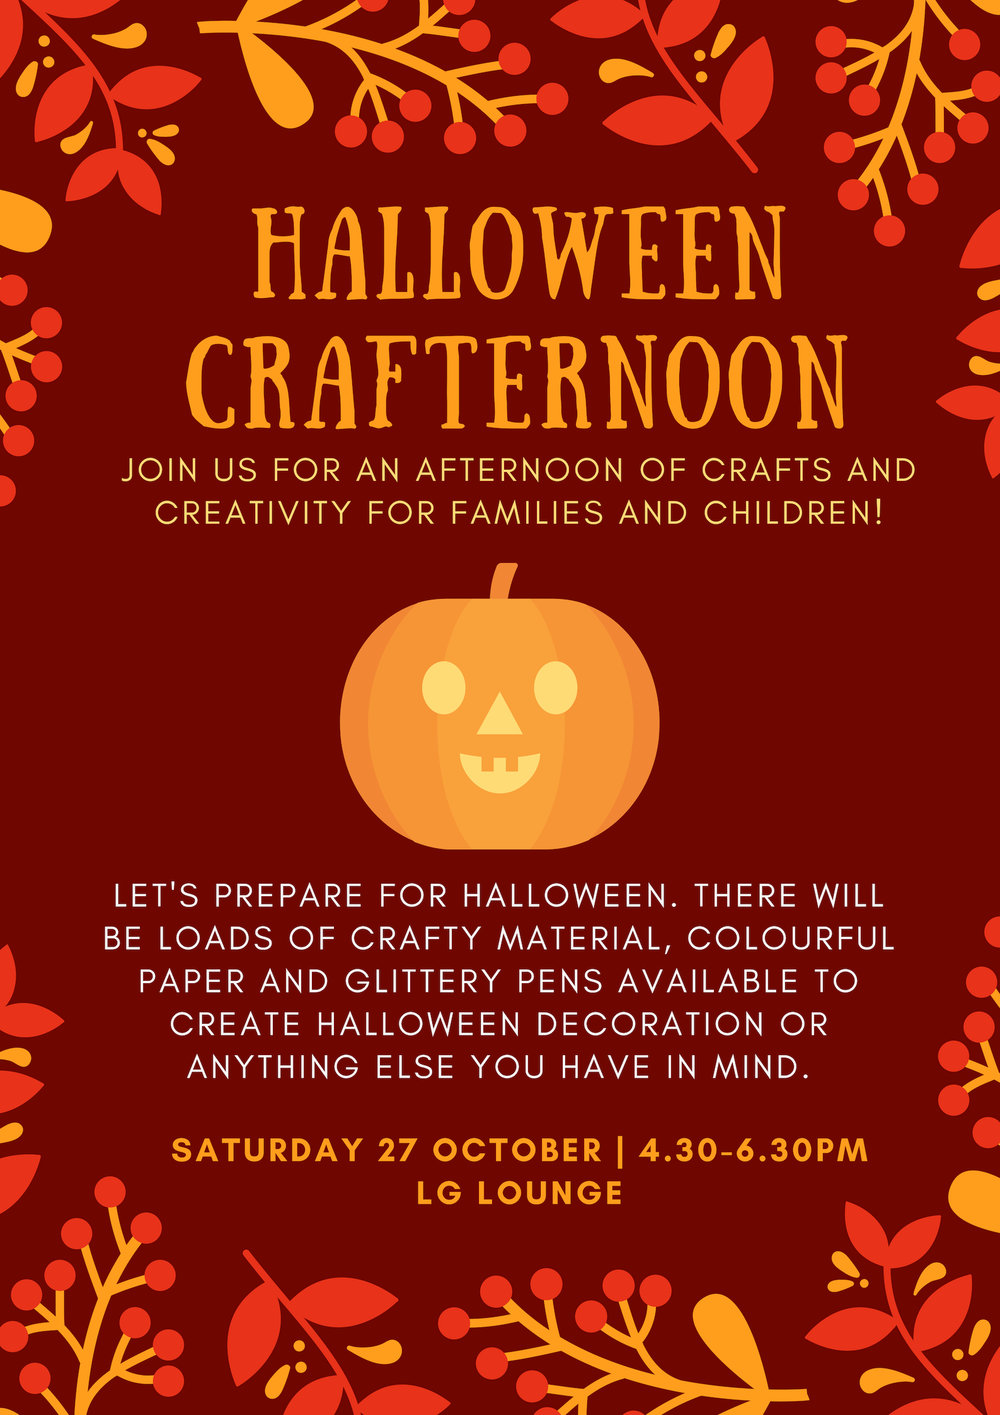 Halloween Craftrnoon-2.jpg